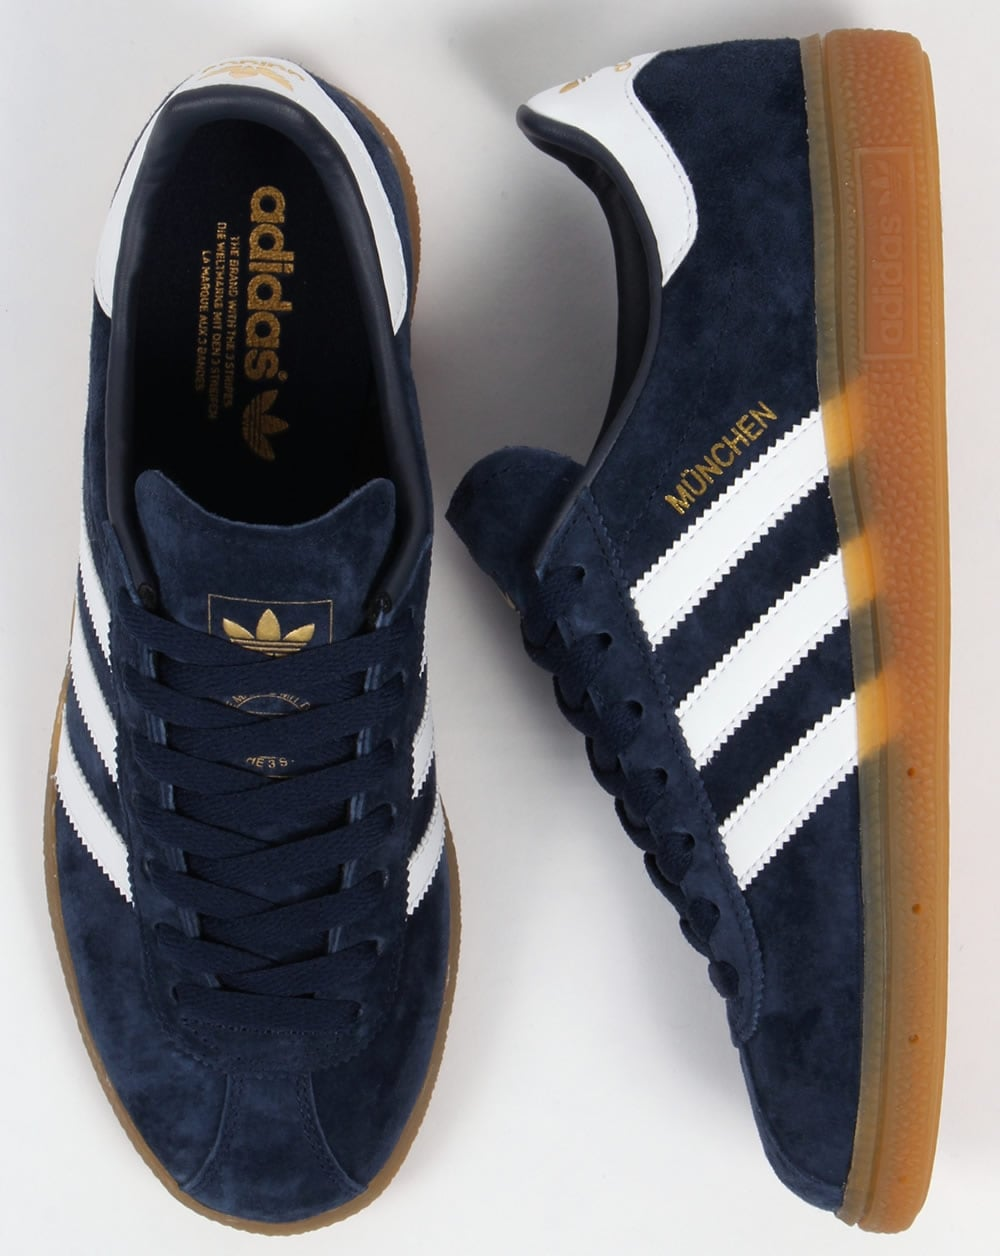 Adidas Munchen Trainers Navy/White,shoes,blue,originals